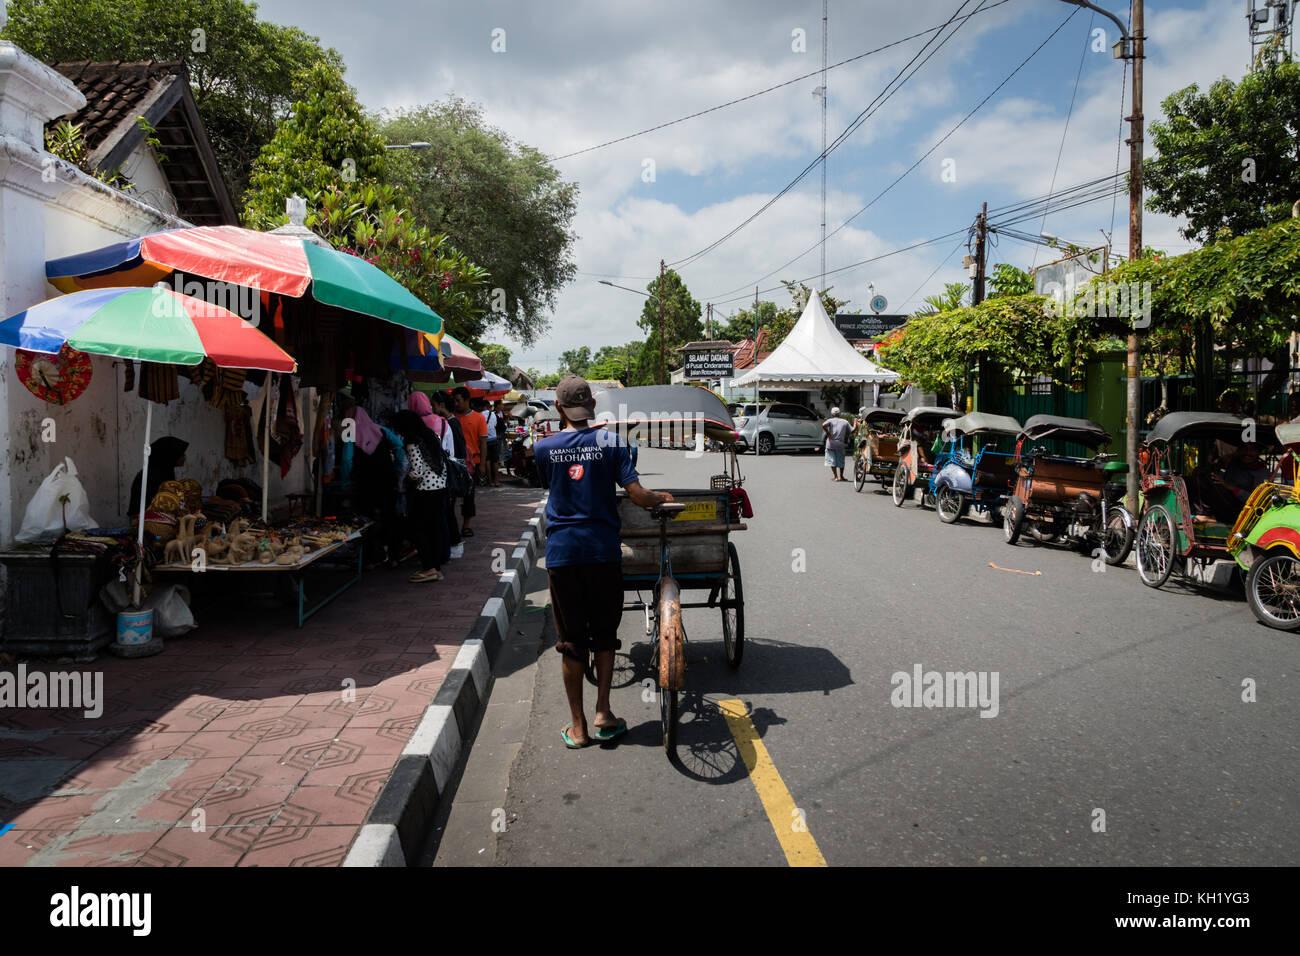 Yogyakarta - ottobre 2017: rikshaw tradizionale trasporto su strade di Yogyakarta, java, Indonesia. noleggio rikshaw Immagini Stock